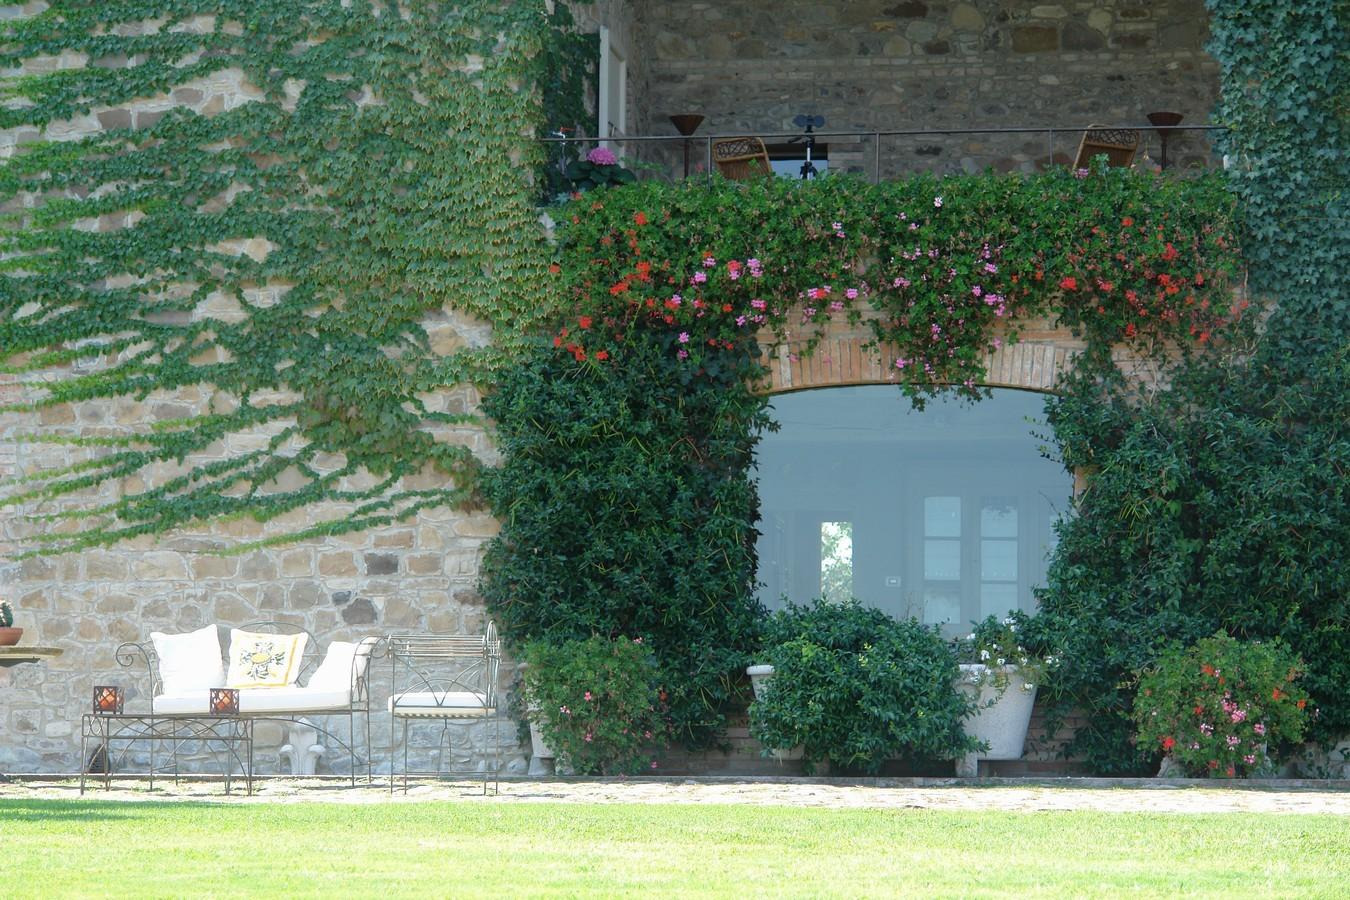 Giardino stile country giardini paghera for Paghera giardini